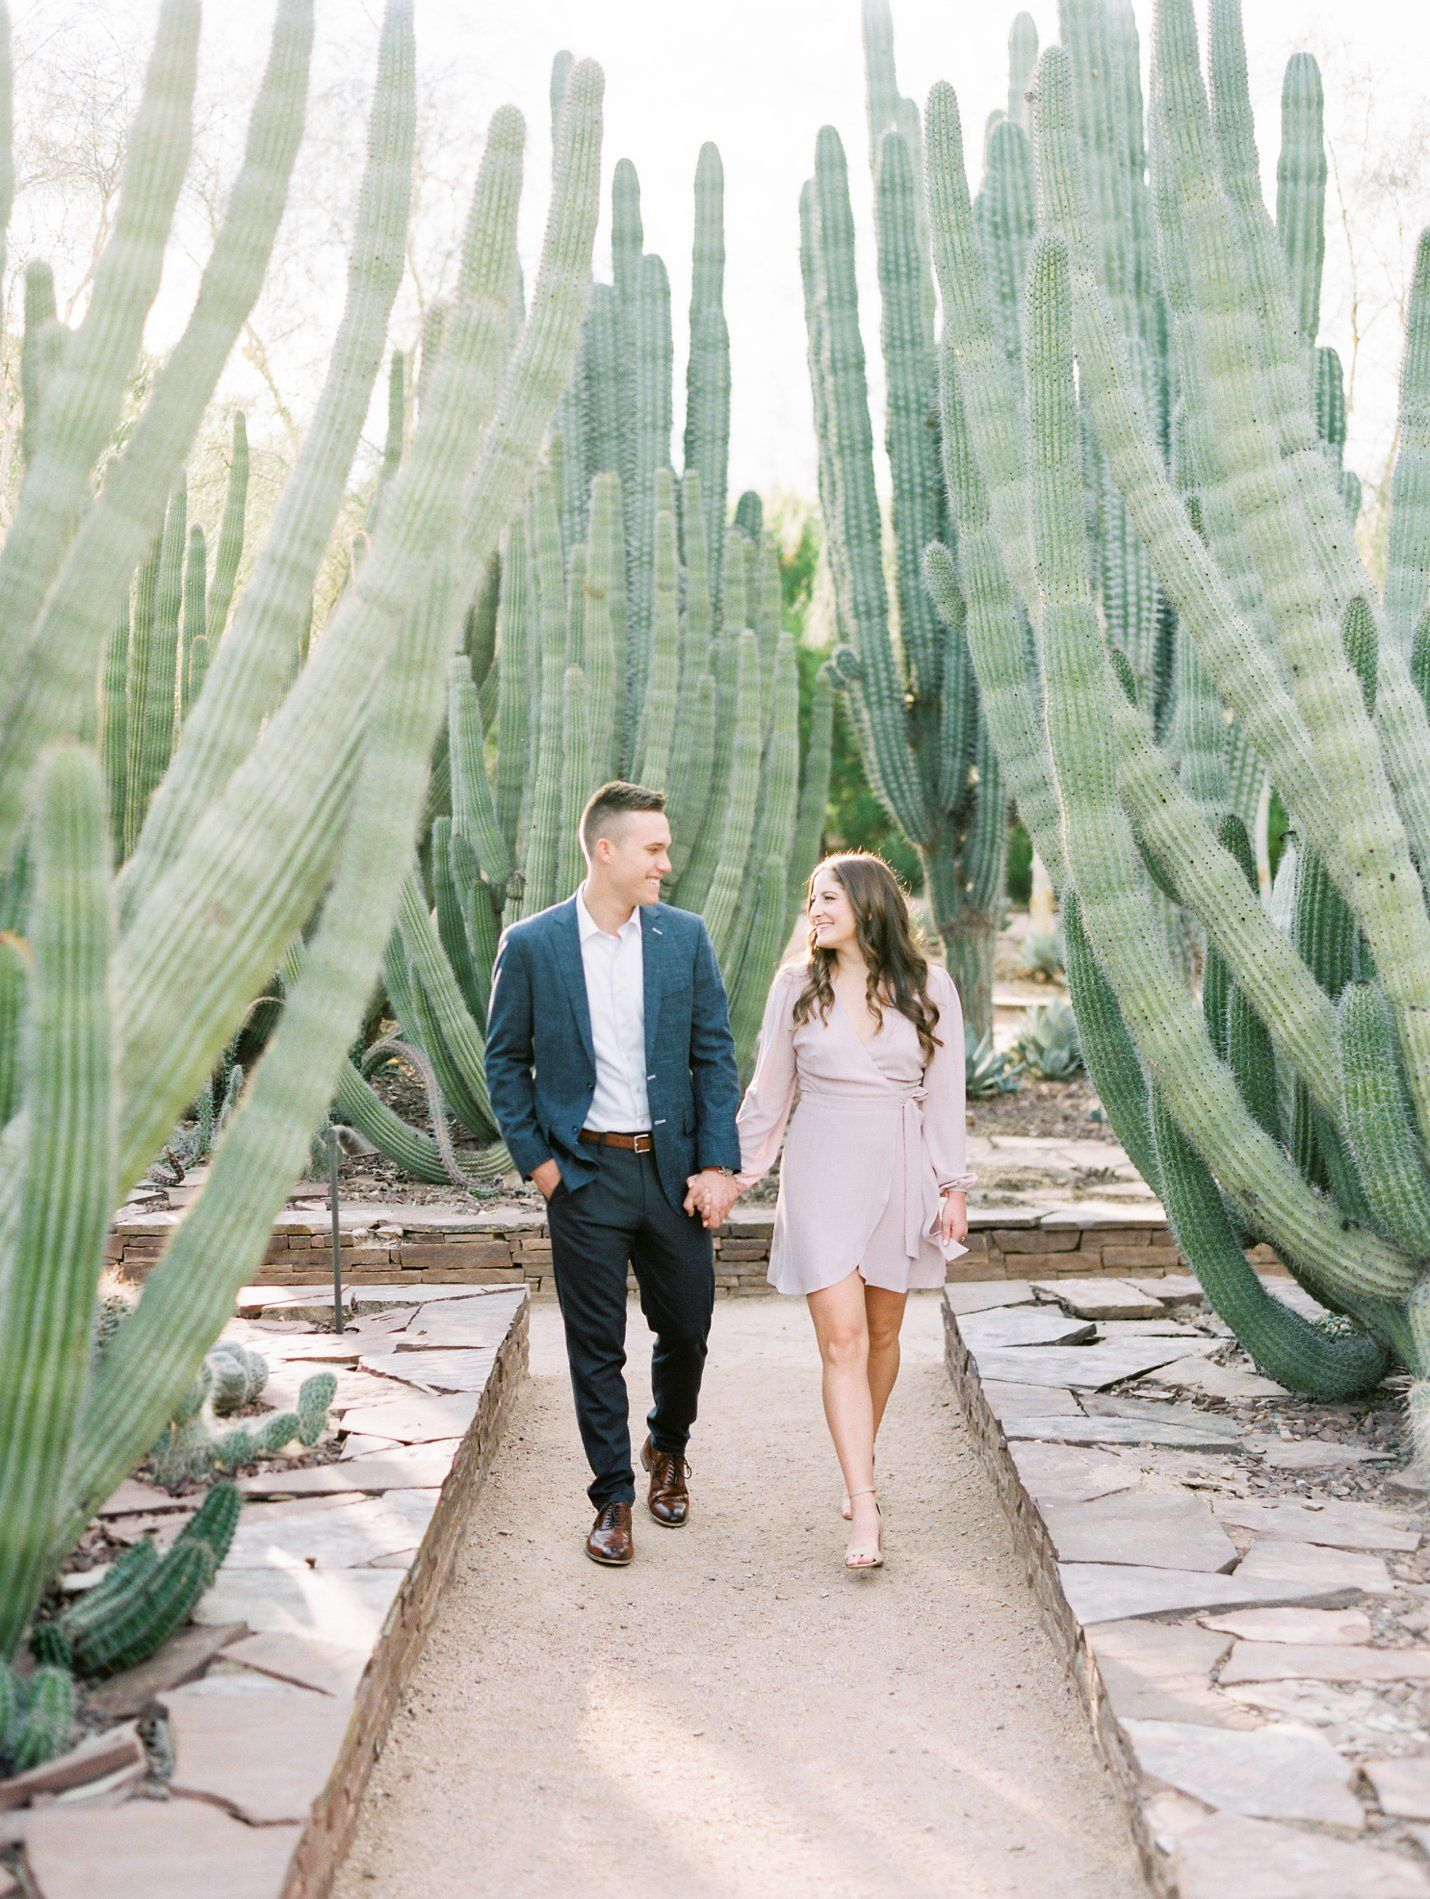 Desert Botanical Garden Engagement - Kara & TJ #botanicgarden